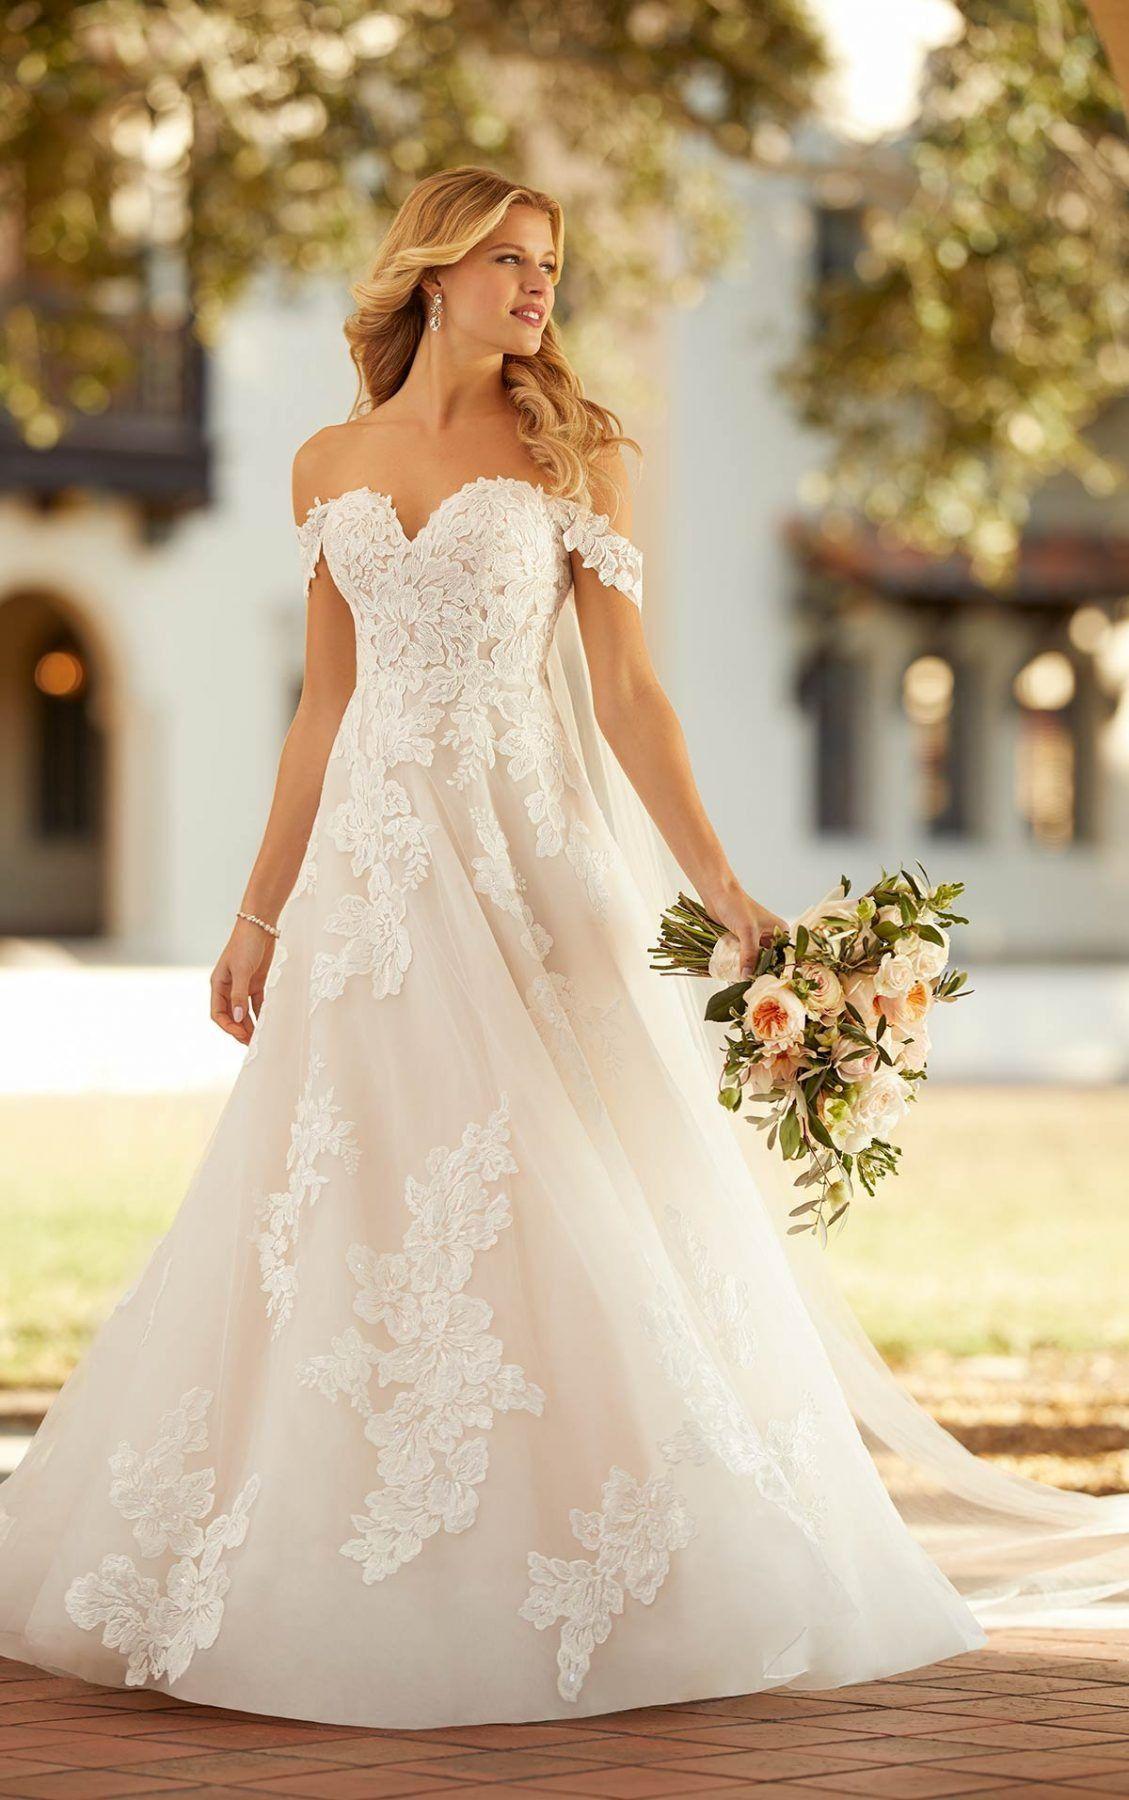 Garden Inspired Off The Shoulder Wedding Dress Kleinfeld Bridal In 2021 A Line Wedding Dress Ball Gowns Wedding Wedding Dresses Kleinfeld [ 1800 x 1129 Pixel ]